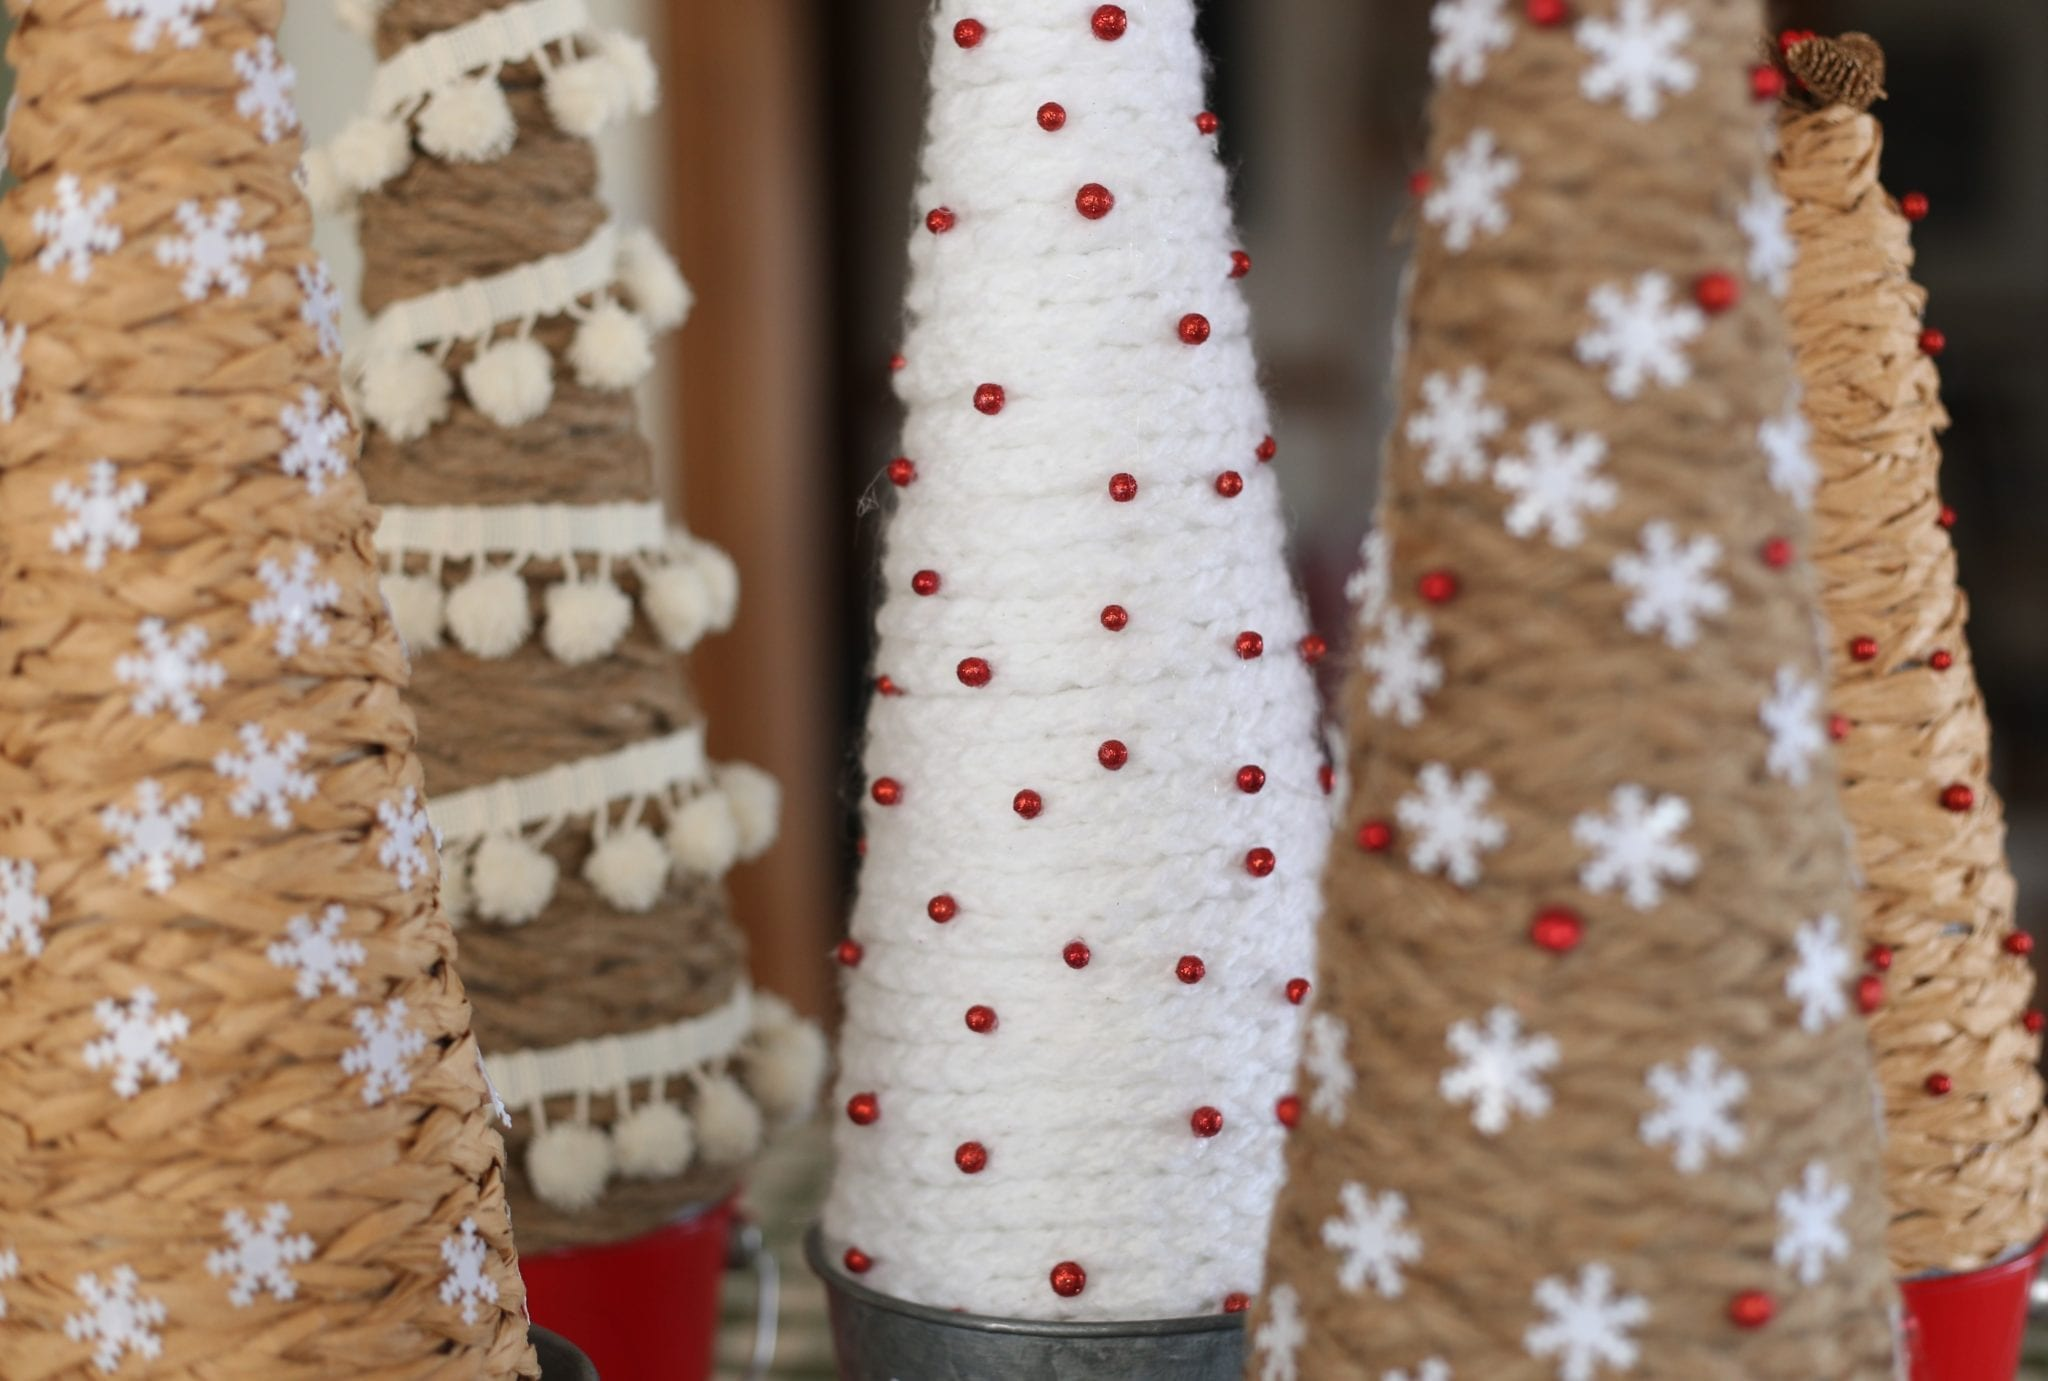 Natural Textured Handmade Trees–Three Ways